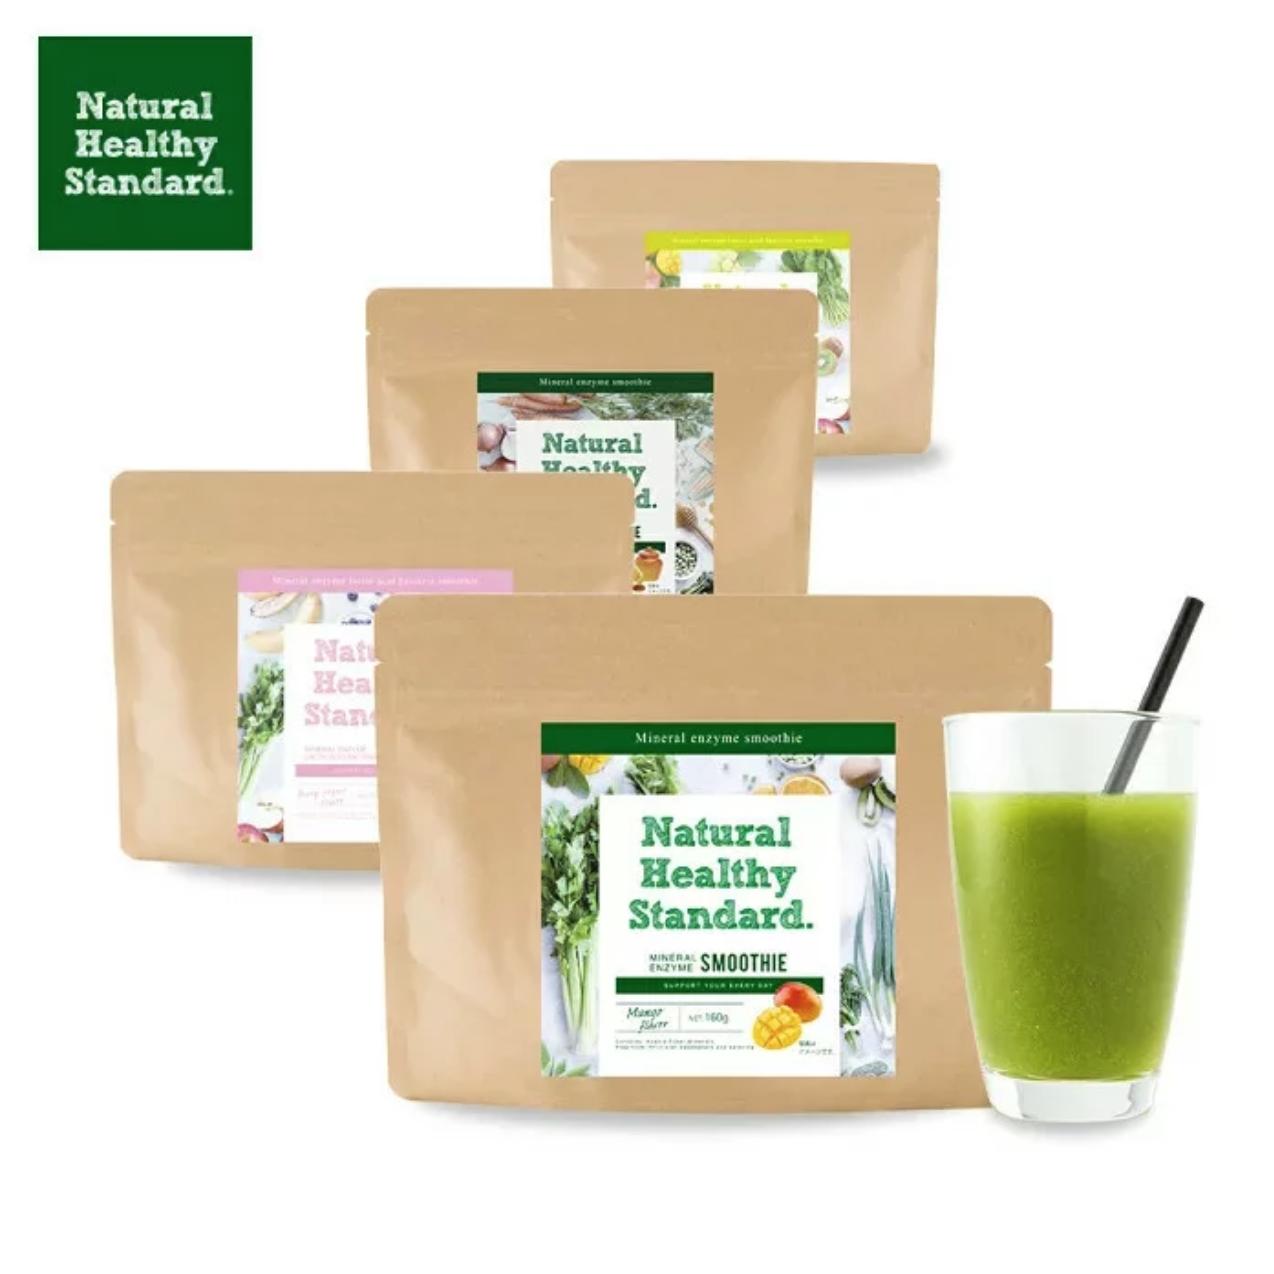 Natural Healthy Standard.(ナチュラルヘルシースタンダード)ミネラル 酵素スムージー